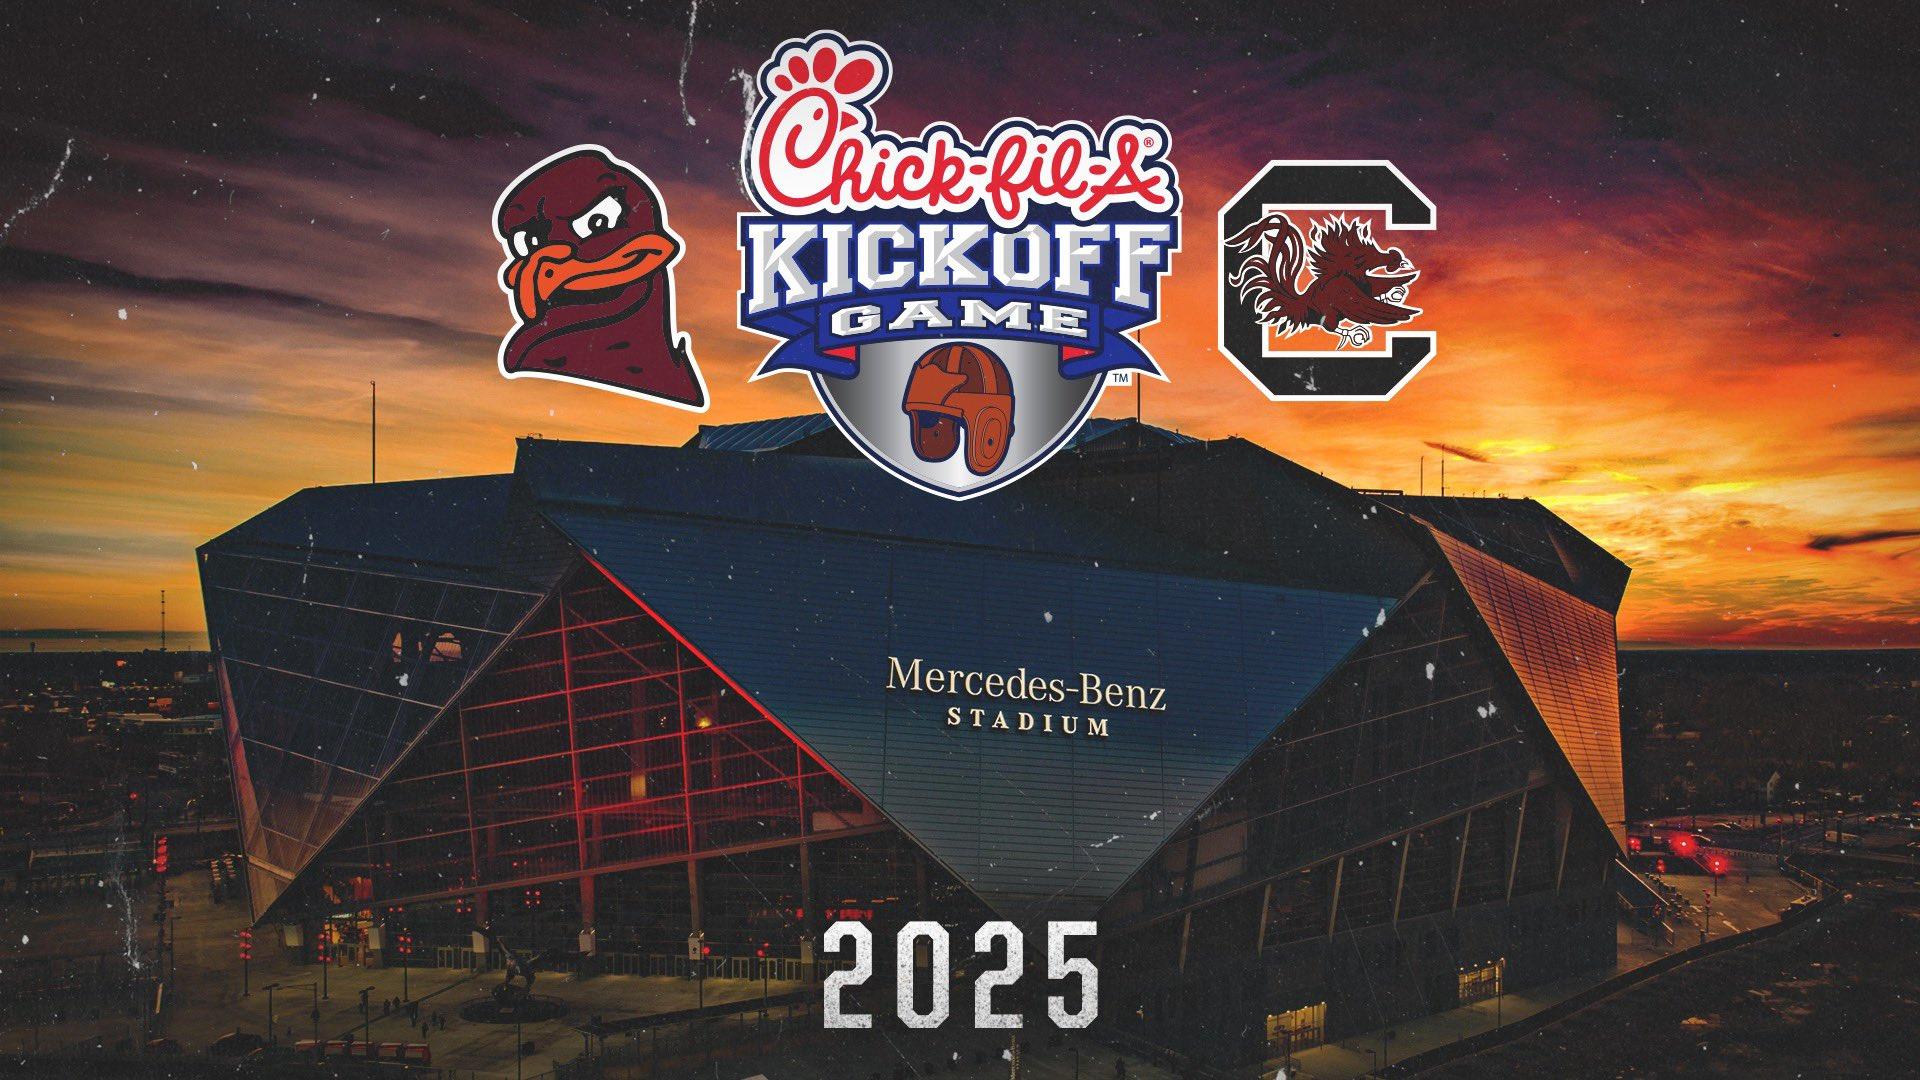 Virginia Tech South Carolina 2025 Chick-fil-A Kickoff Game